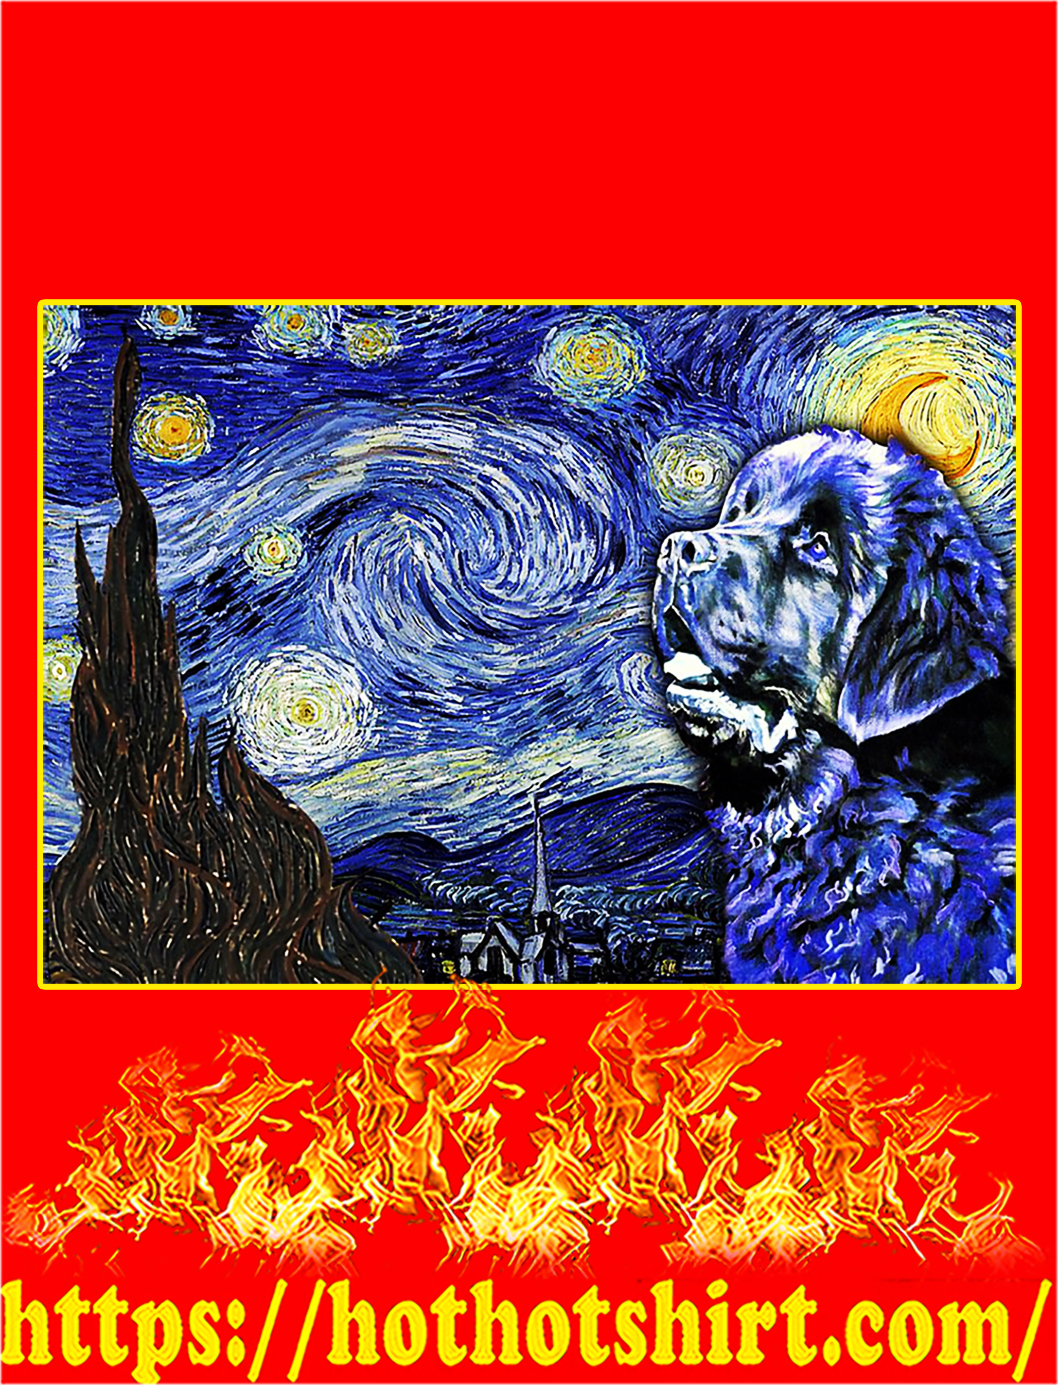 Newfoundland Dog Van Gogh Starry Night Poster - A2